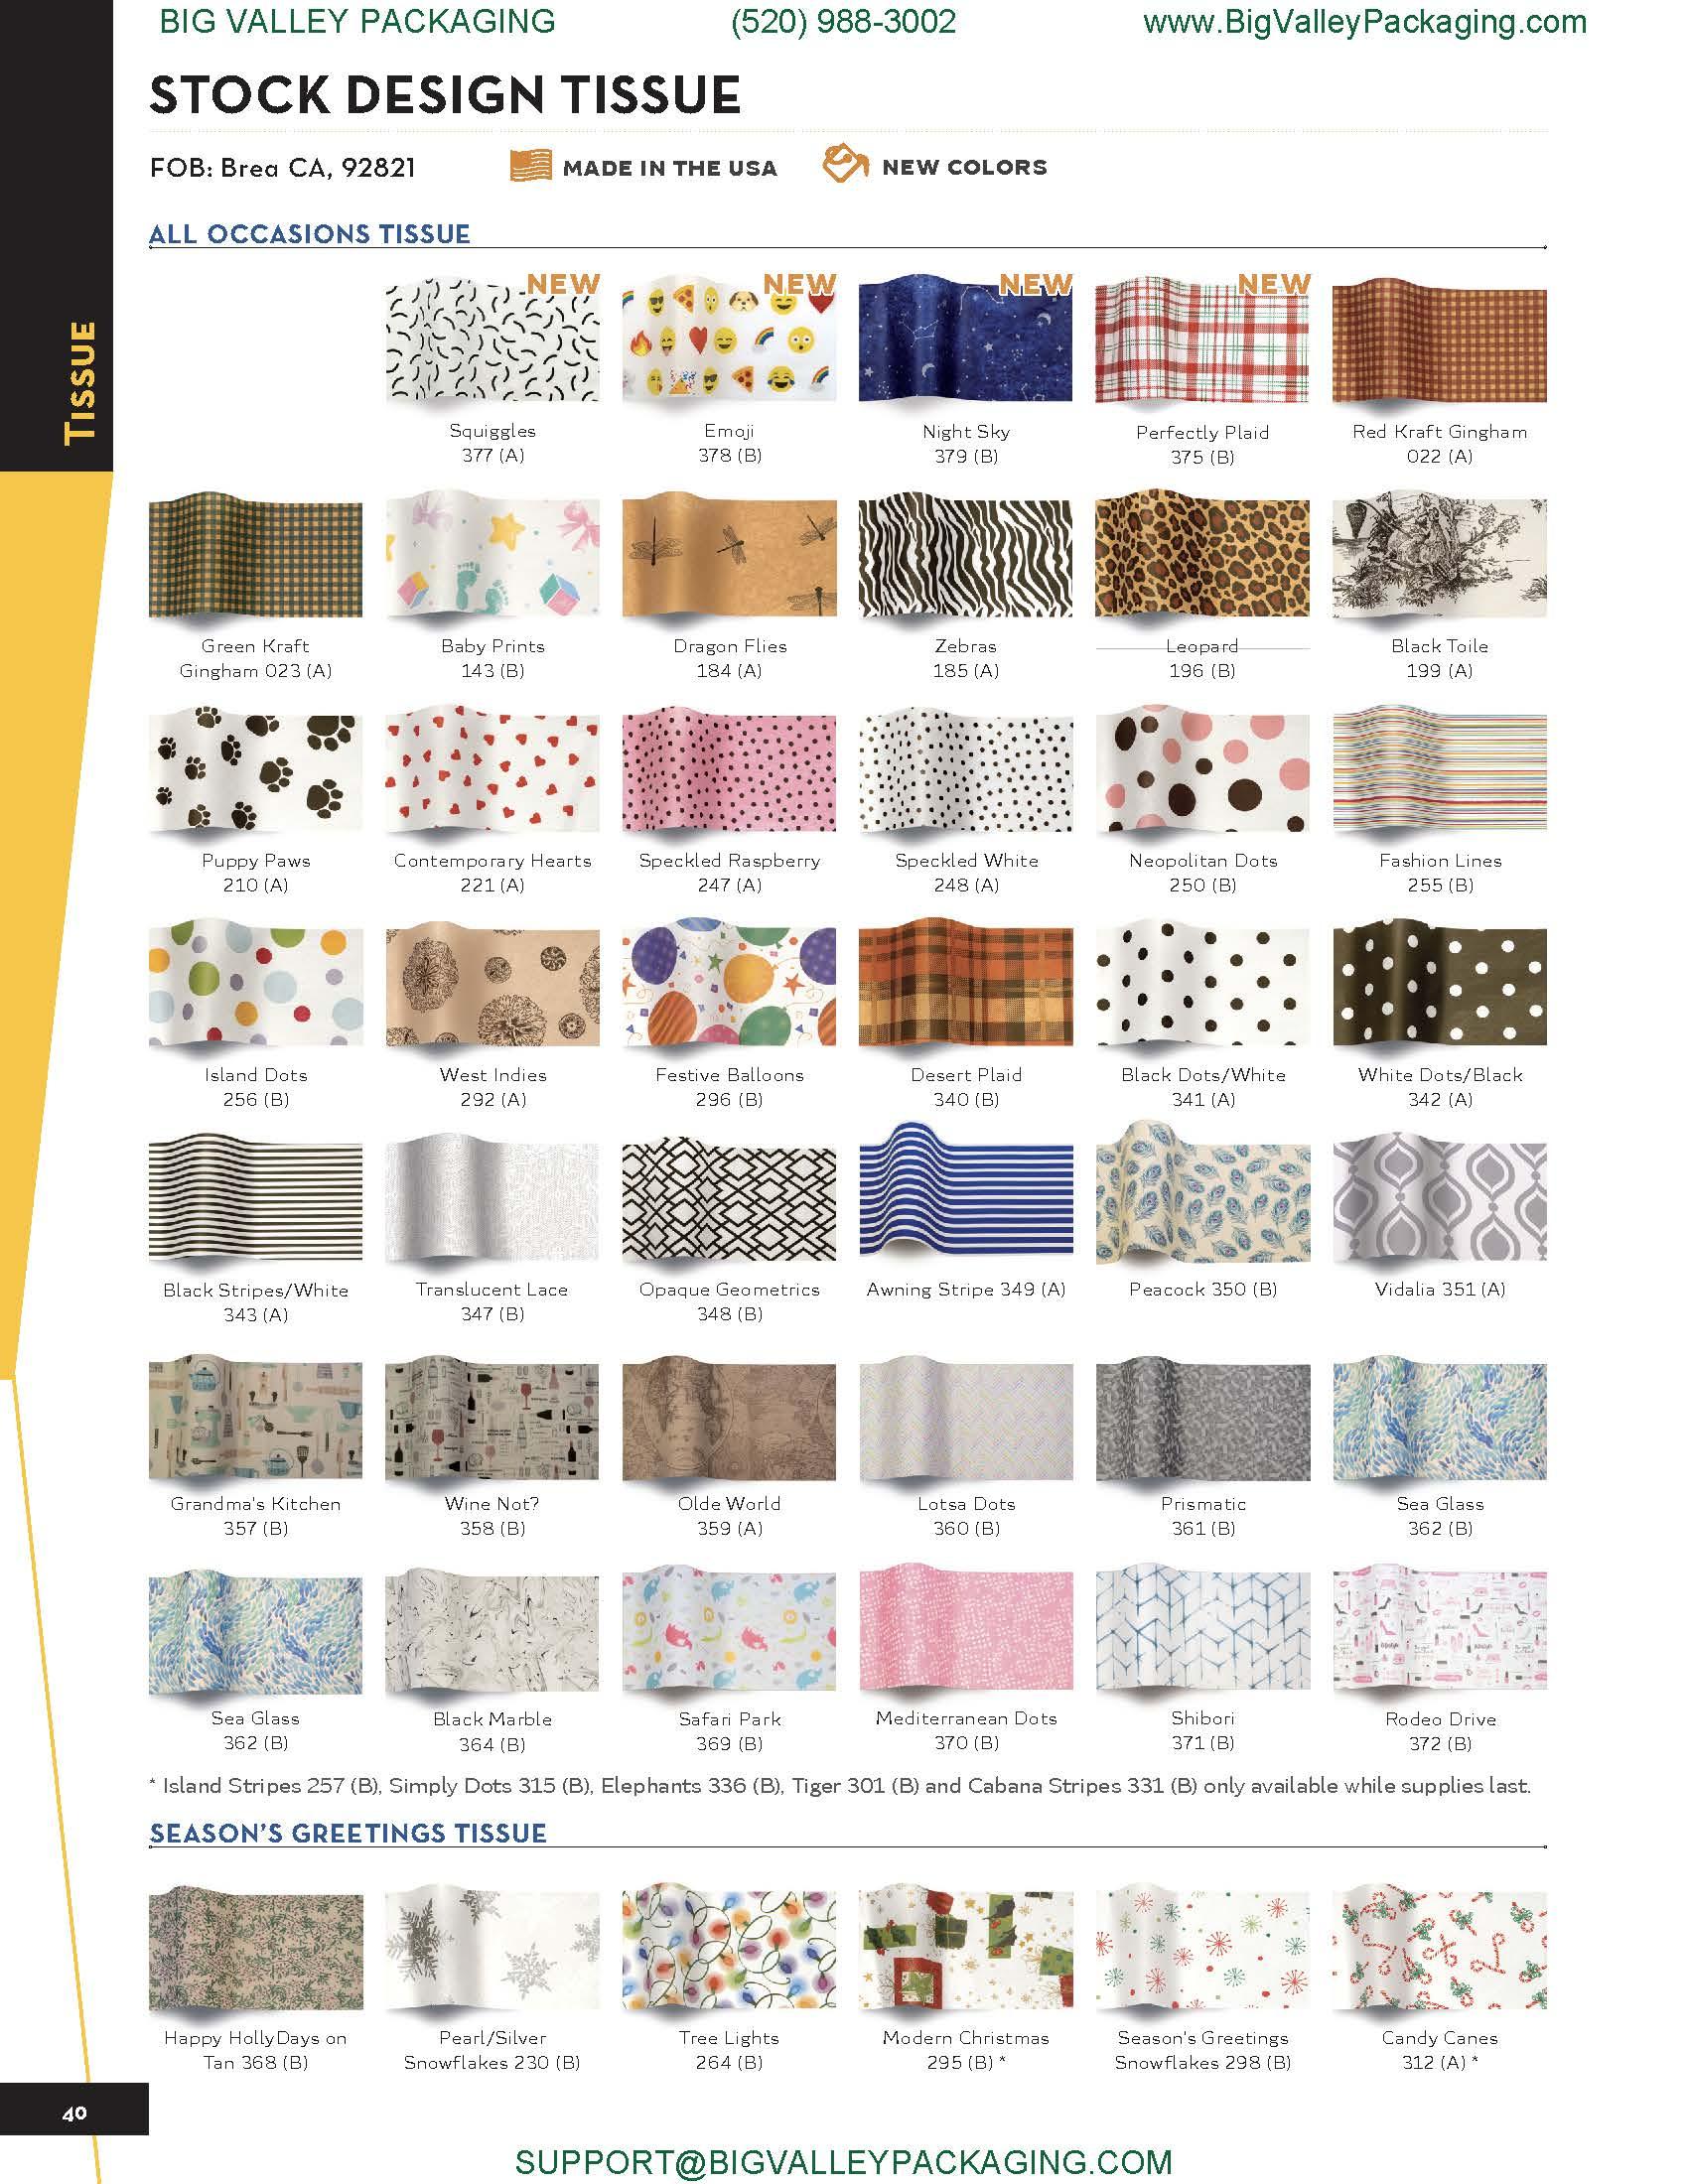 STOCK DESIGN TISSUE PAPER SHEETS